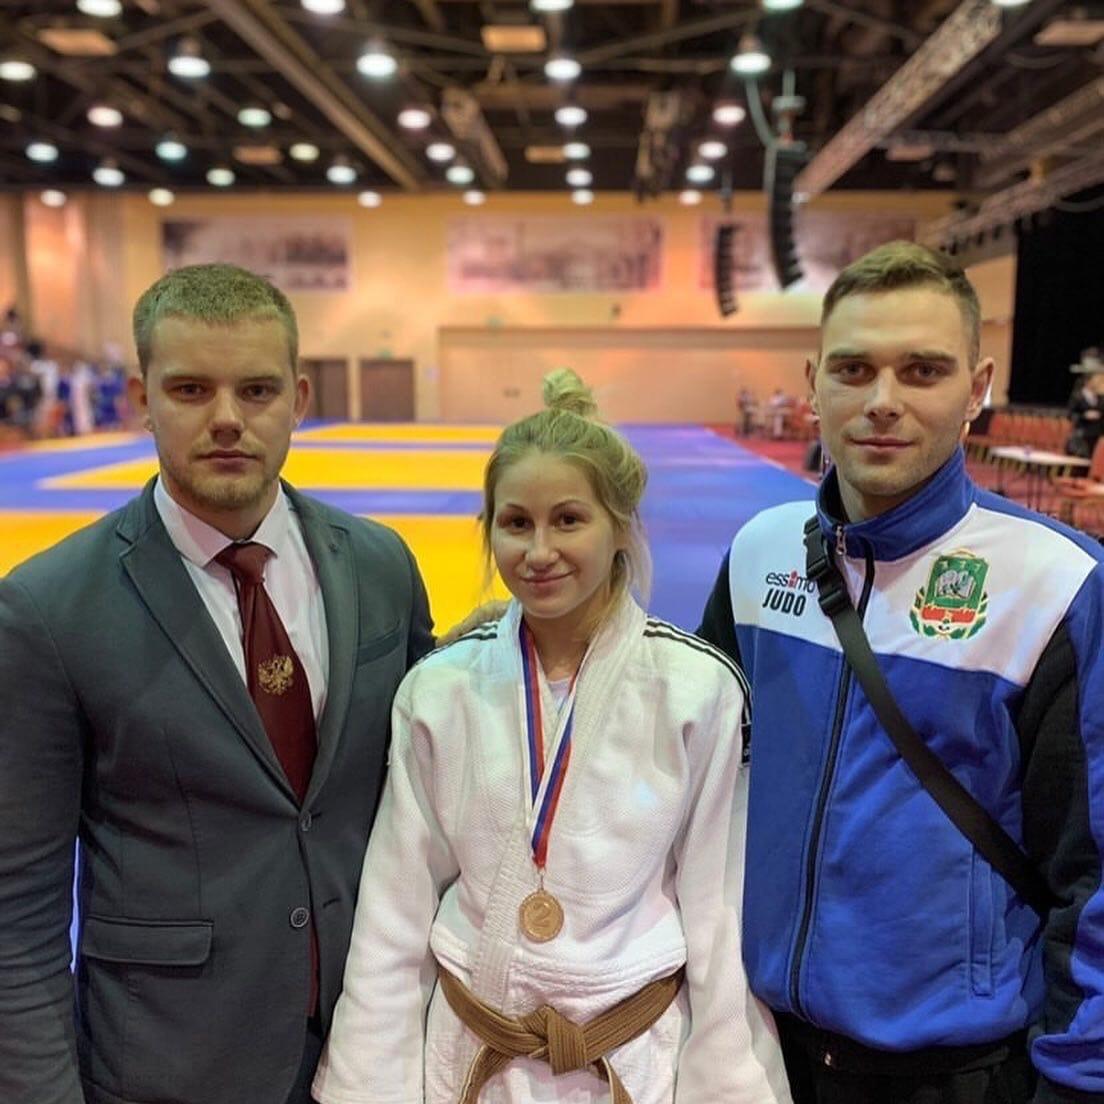 На Первенстве ЦФО по дзюдо тамбовчанка завоевала серебряную медаль